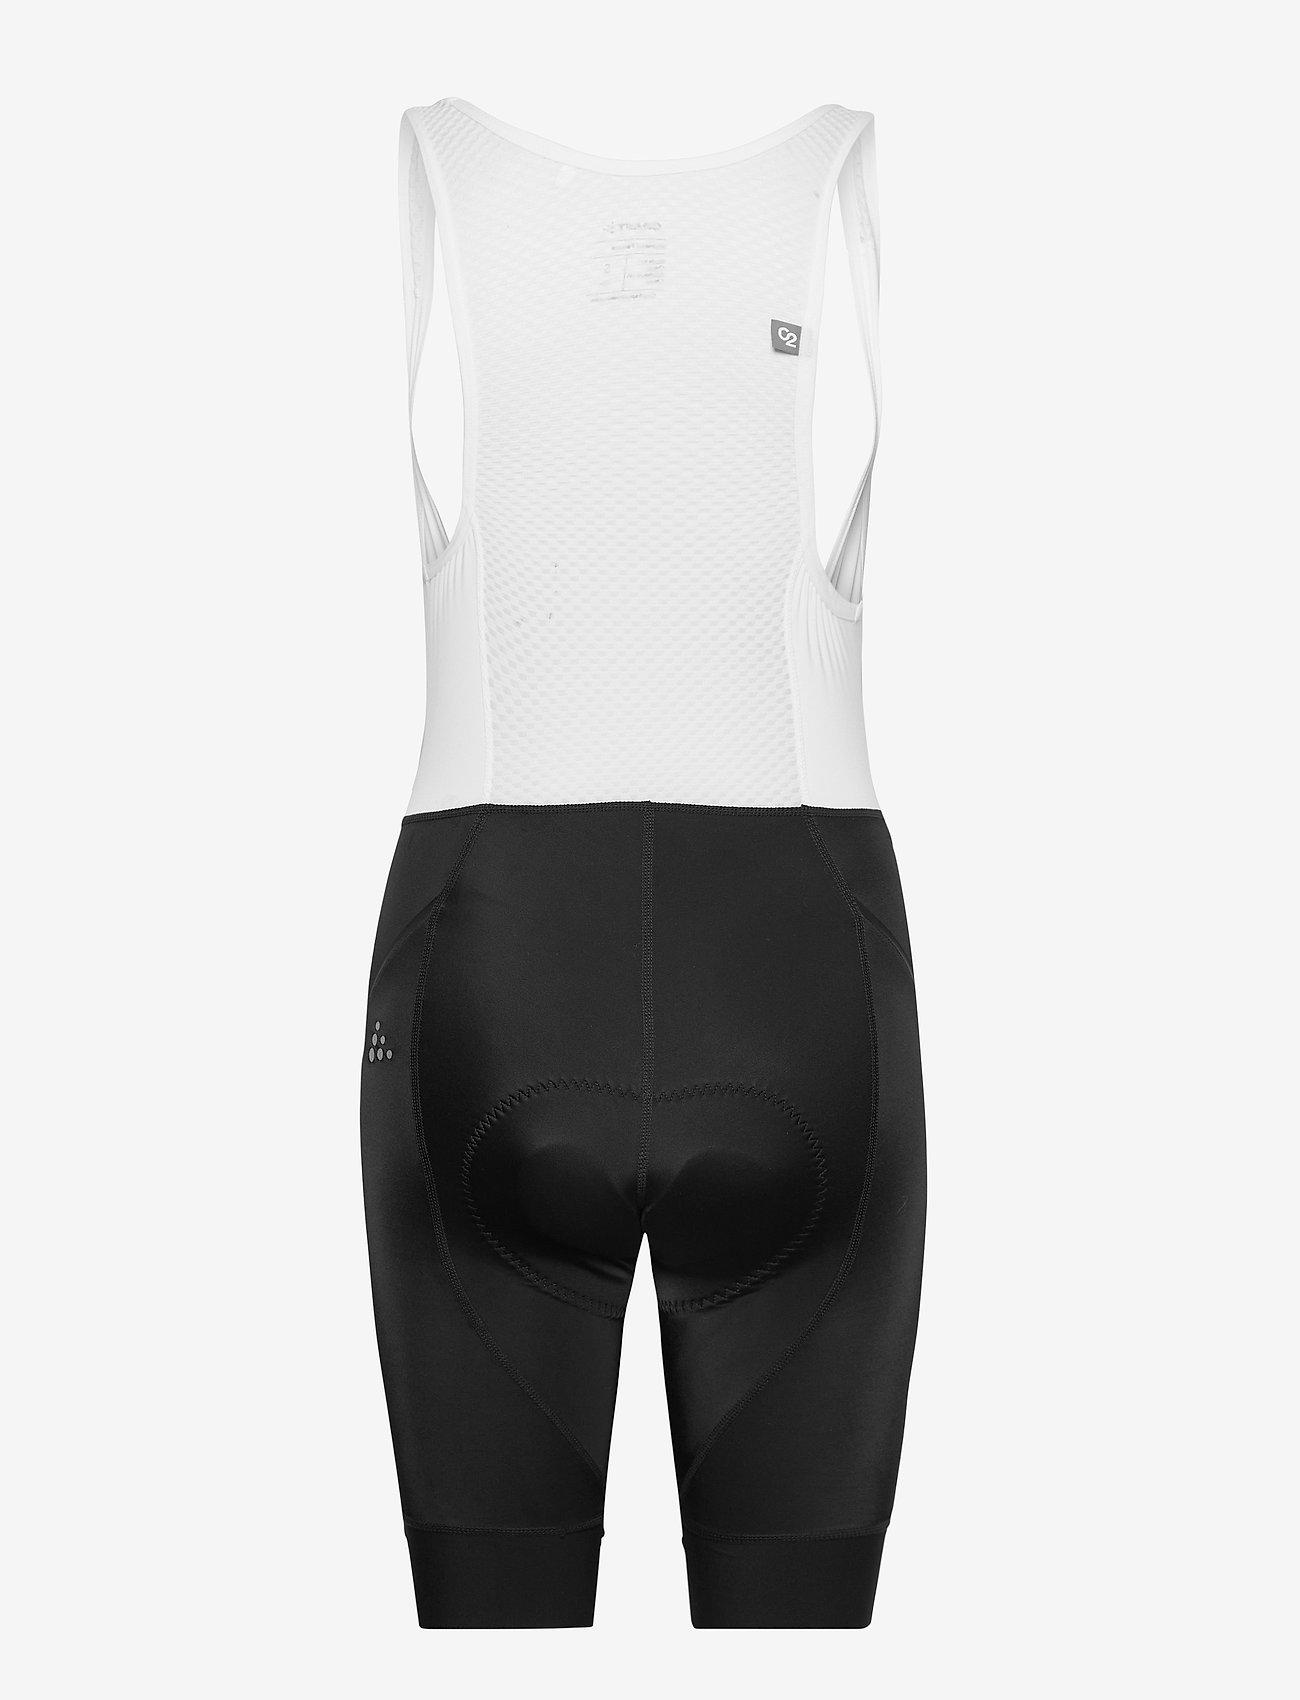 Craft - Adv Endur Bib Shorts W - wielrenshorts & -leggings - black - 1